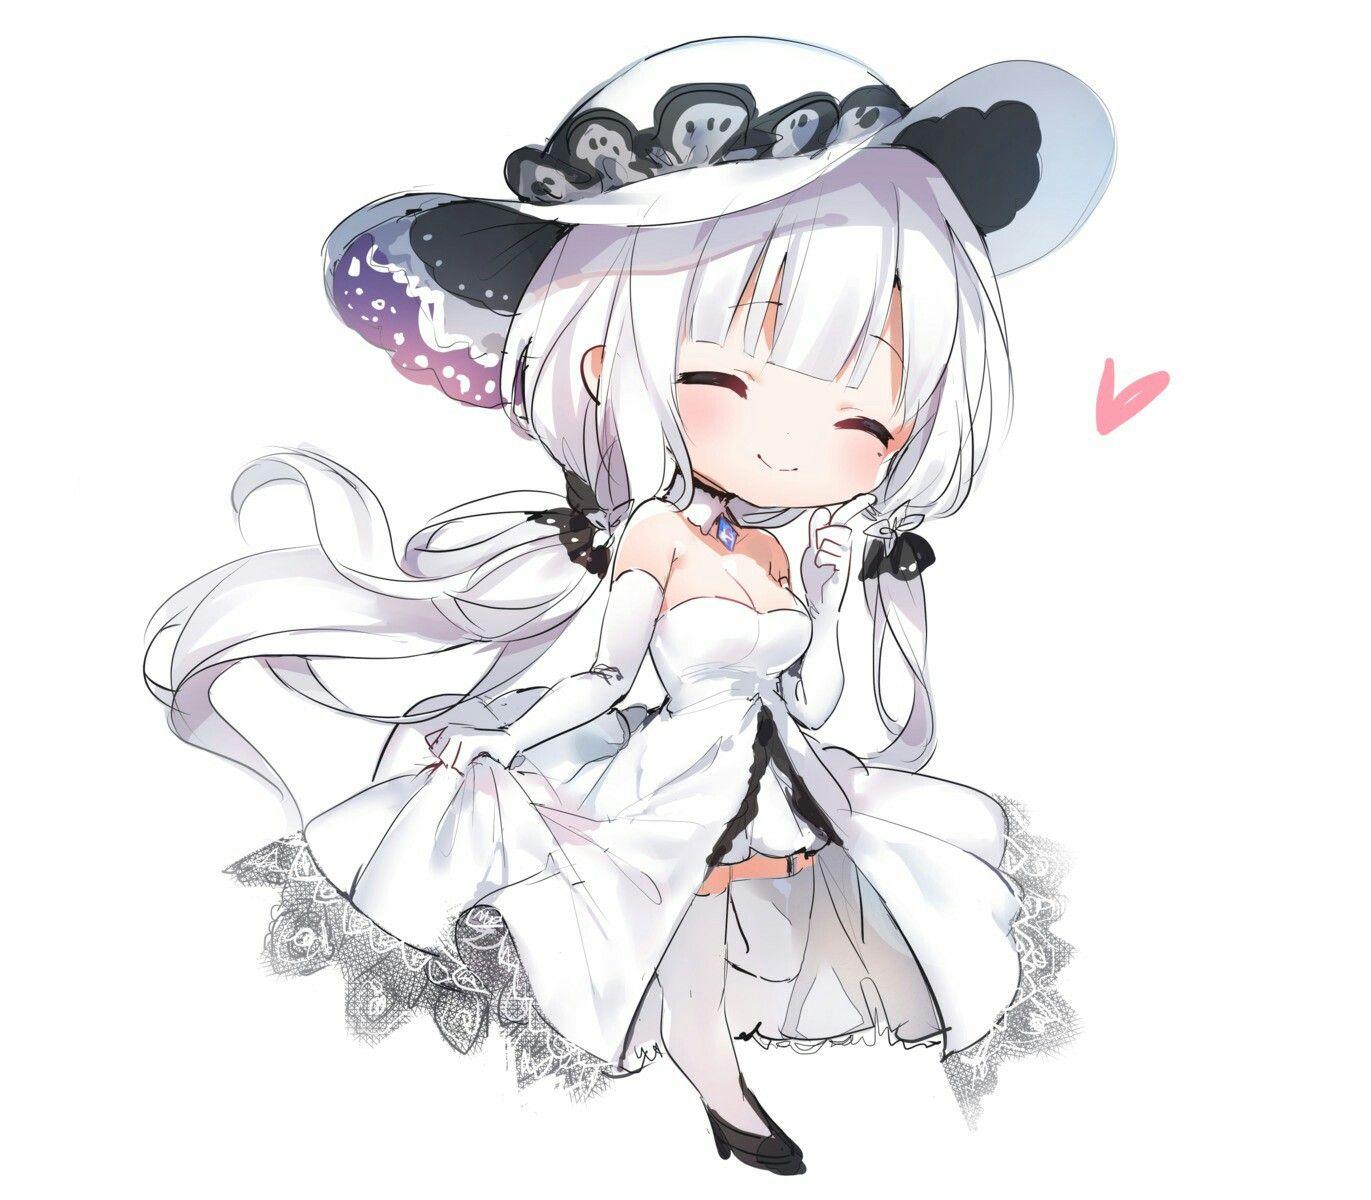 Pin by haozhe heng on anime Cute anime chibi, Anime